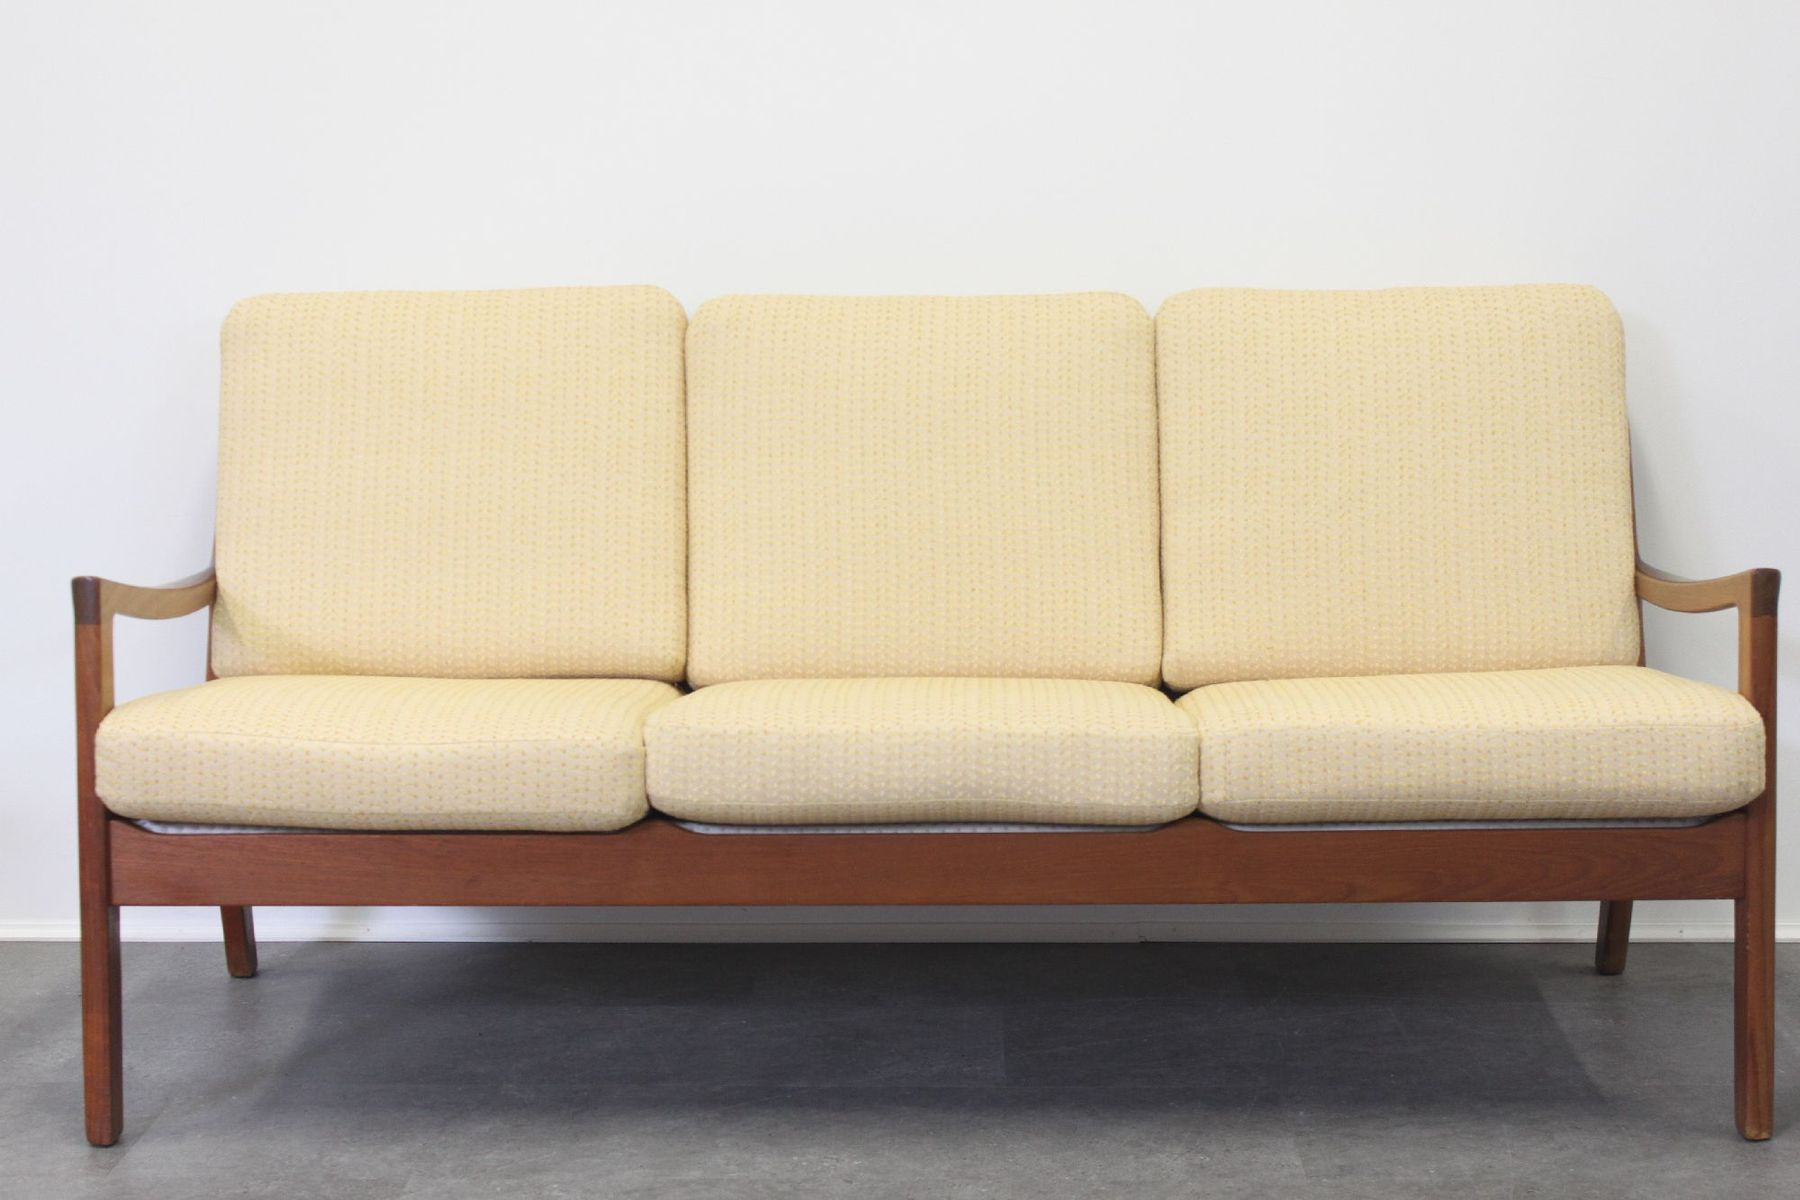 Vintage Teak Three Seater Senator Sofa by Ole Wanscher for Cado